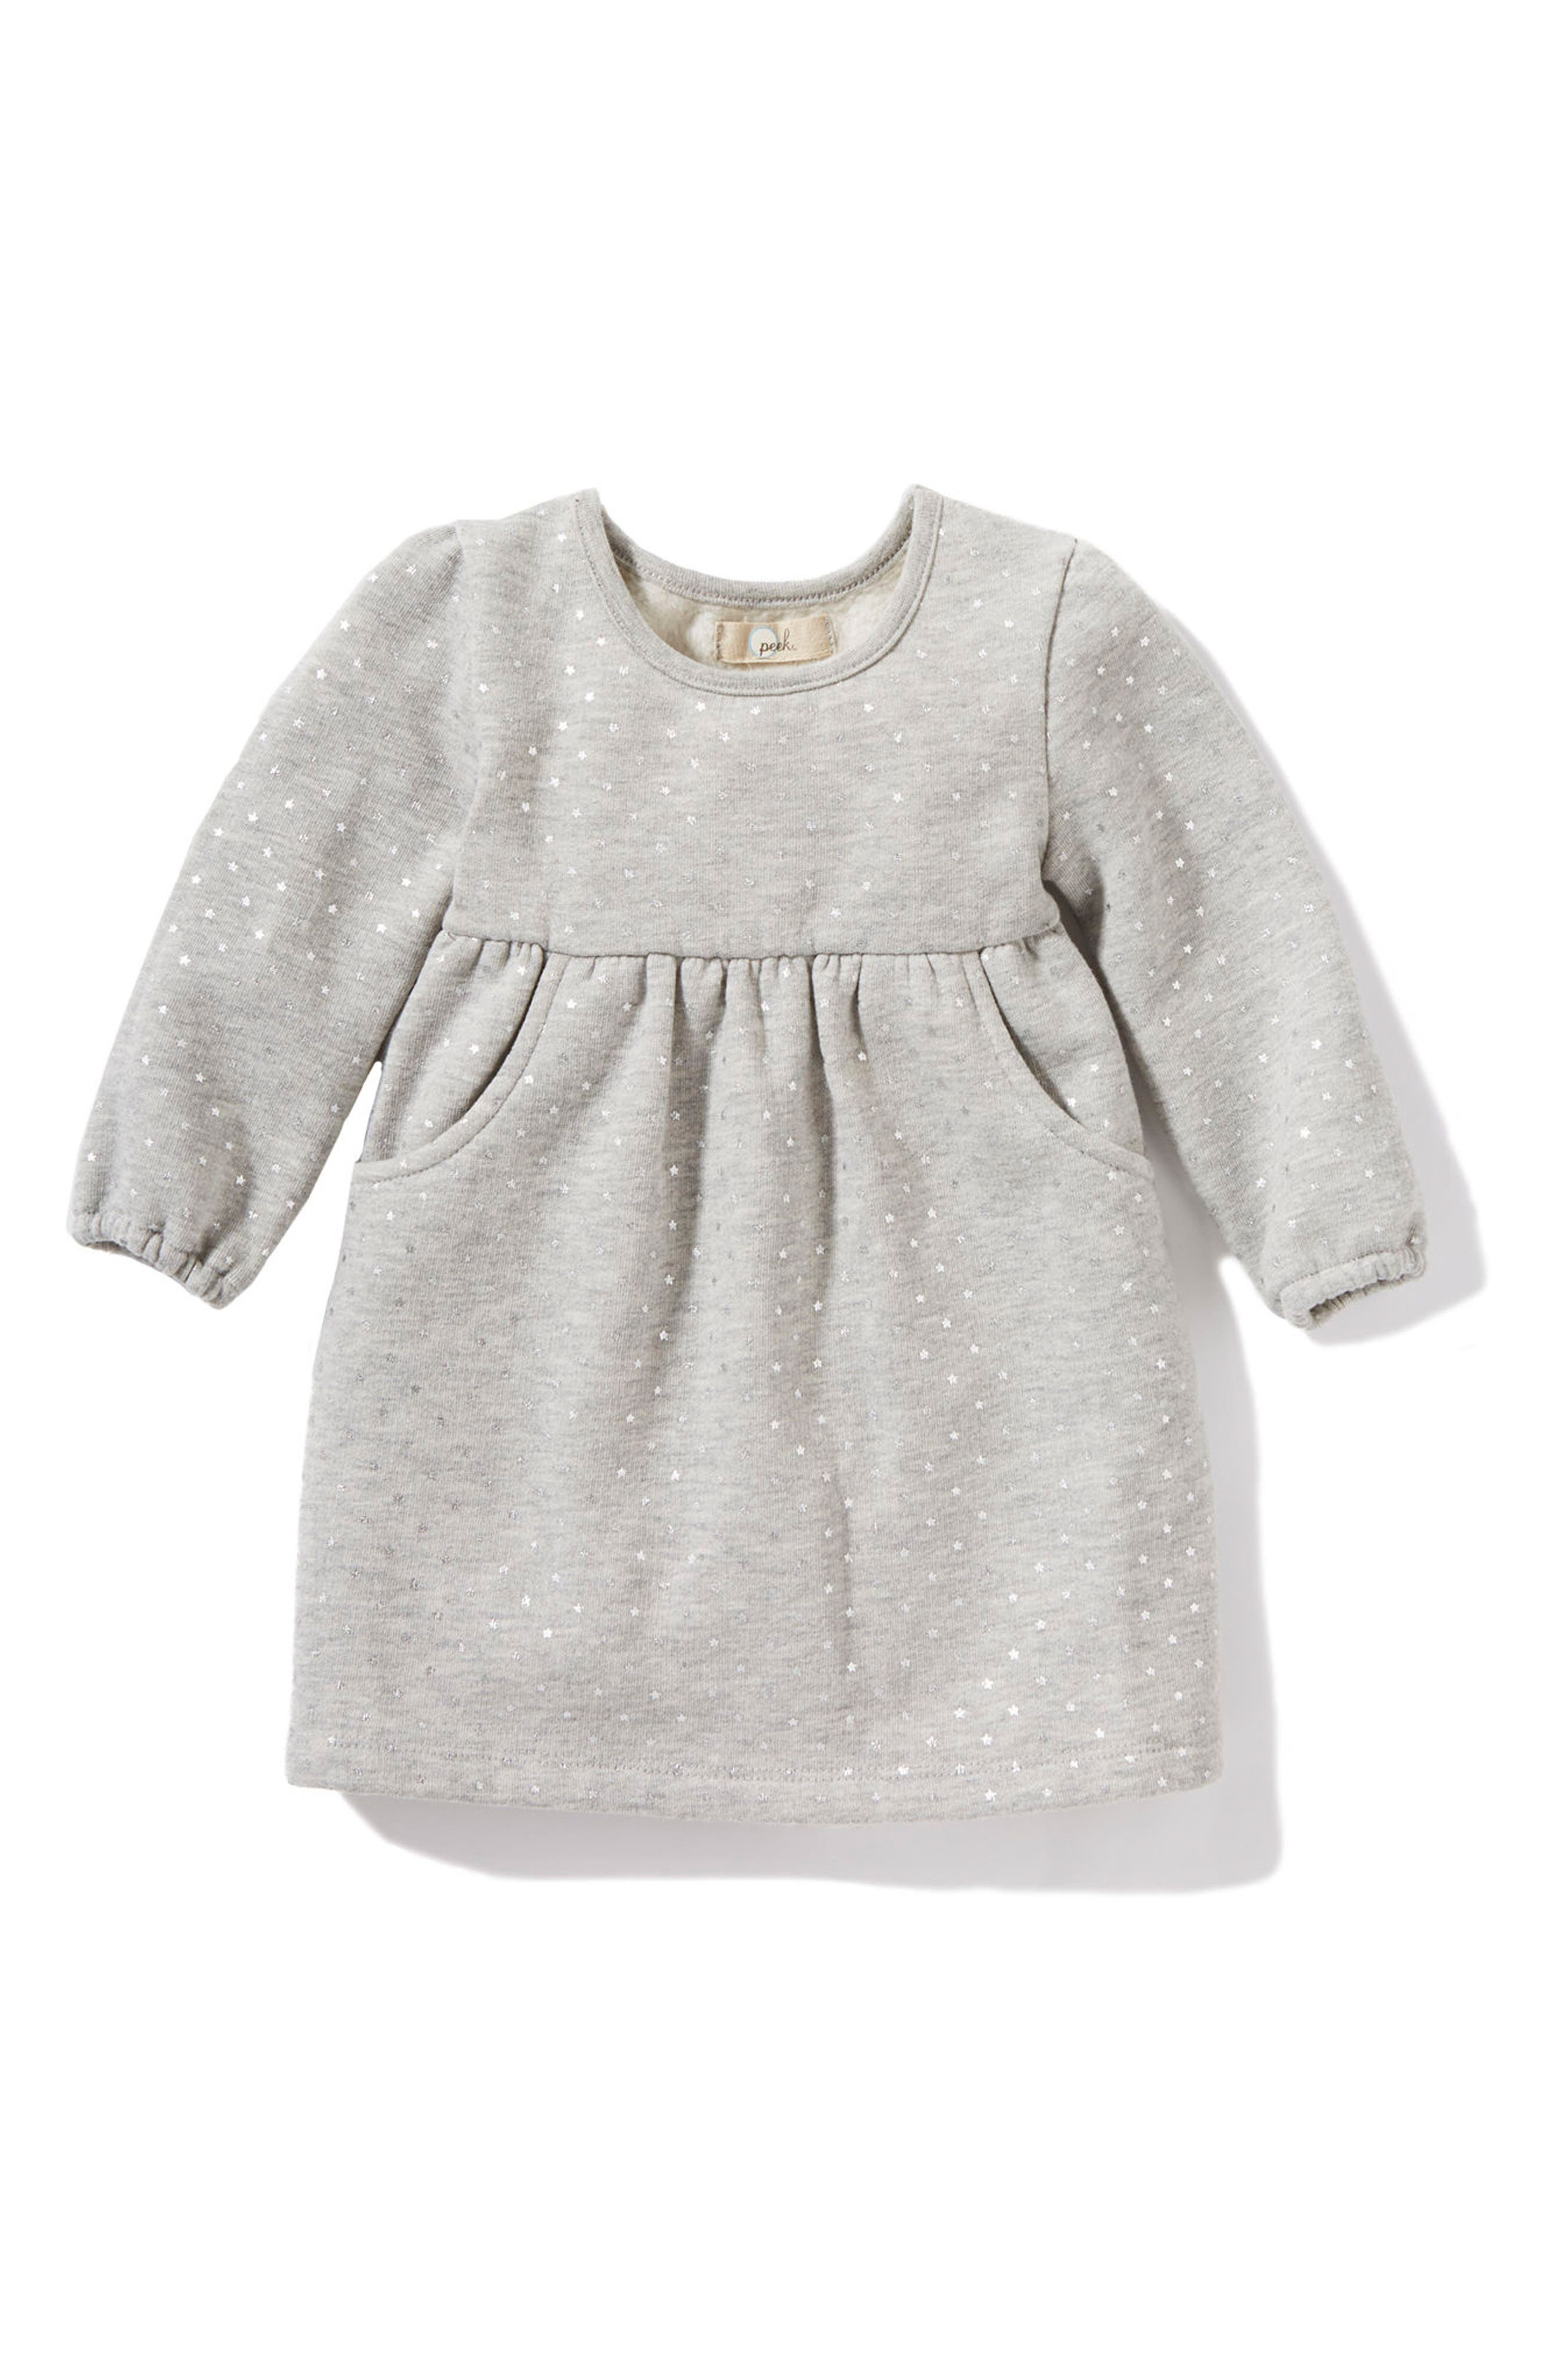 Alternate Image 1 Selected - Peek Star Dress (Baby Girls)